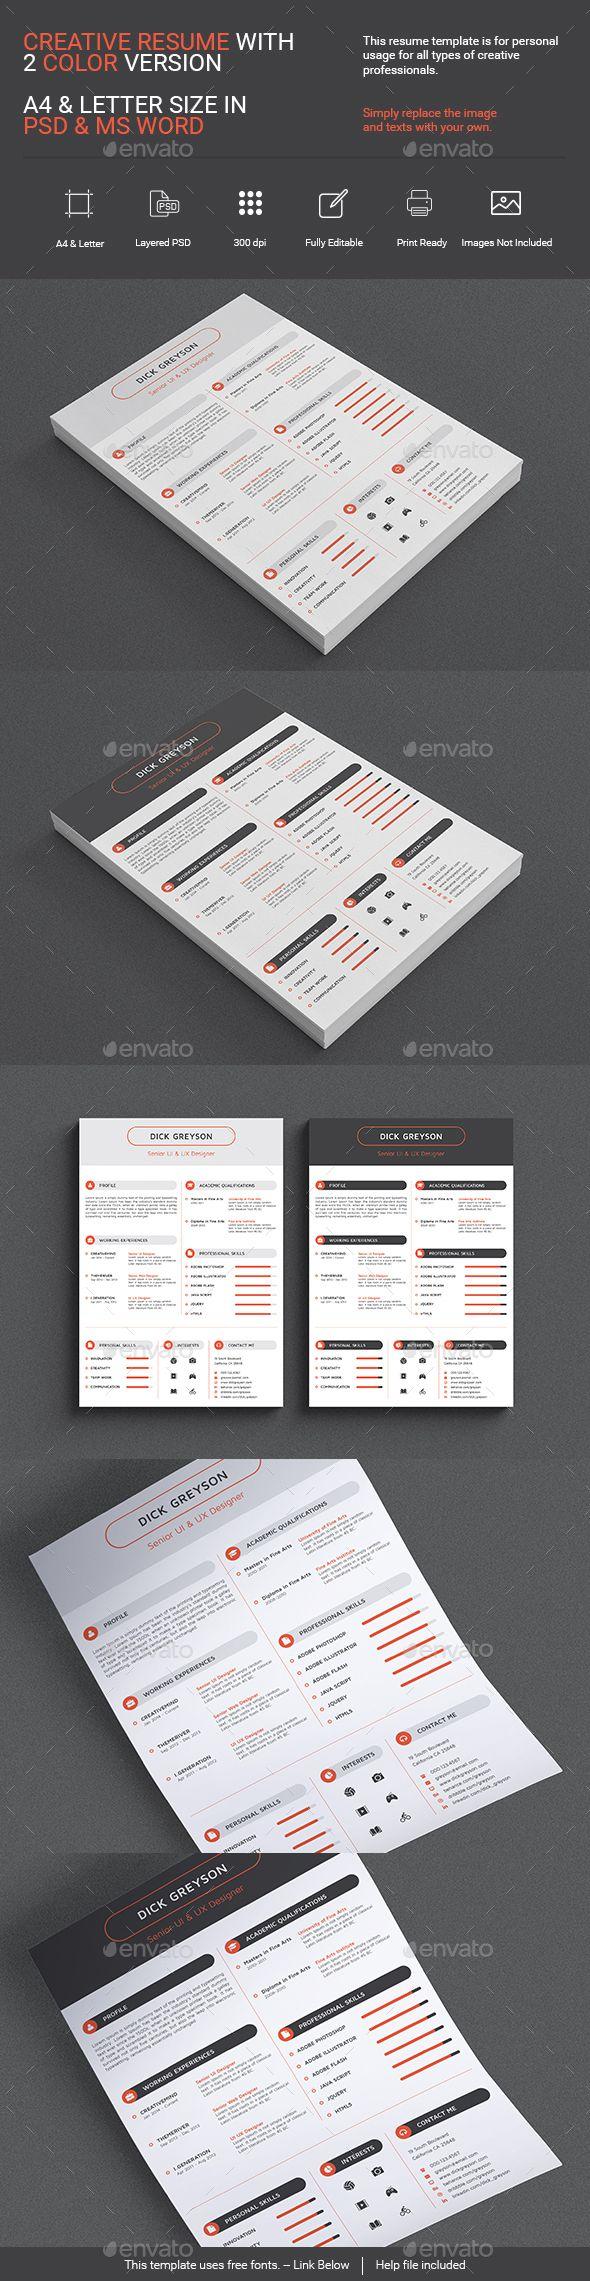 45 best CV/Resume templates images on Pinterest | Cv template, Cv ...